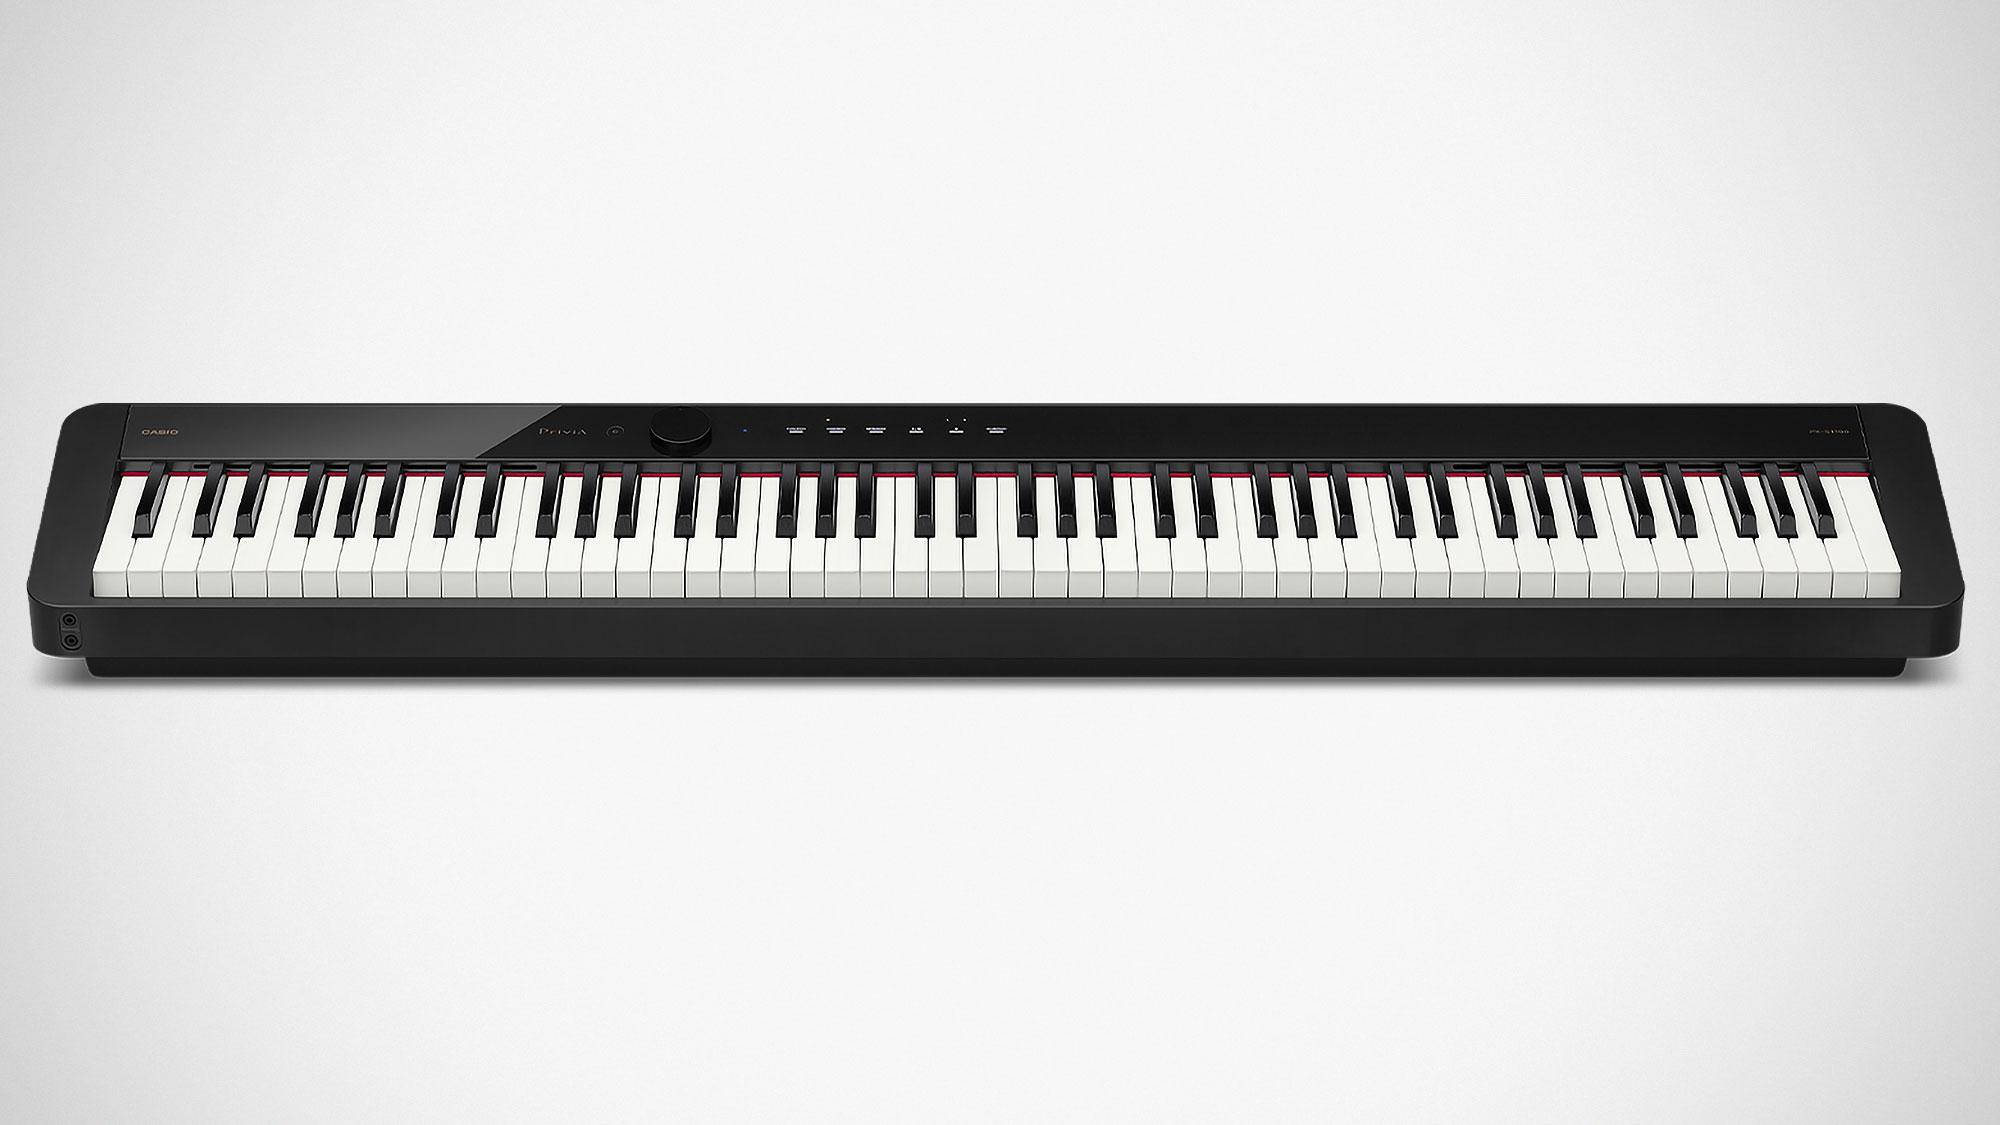 Casio Privia Series PX-S1100 Digital Piano